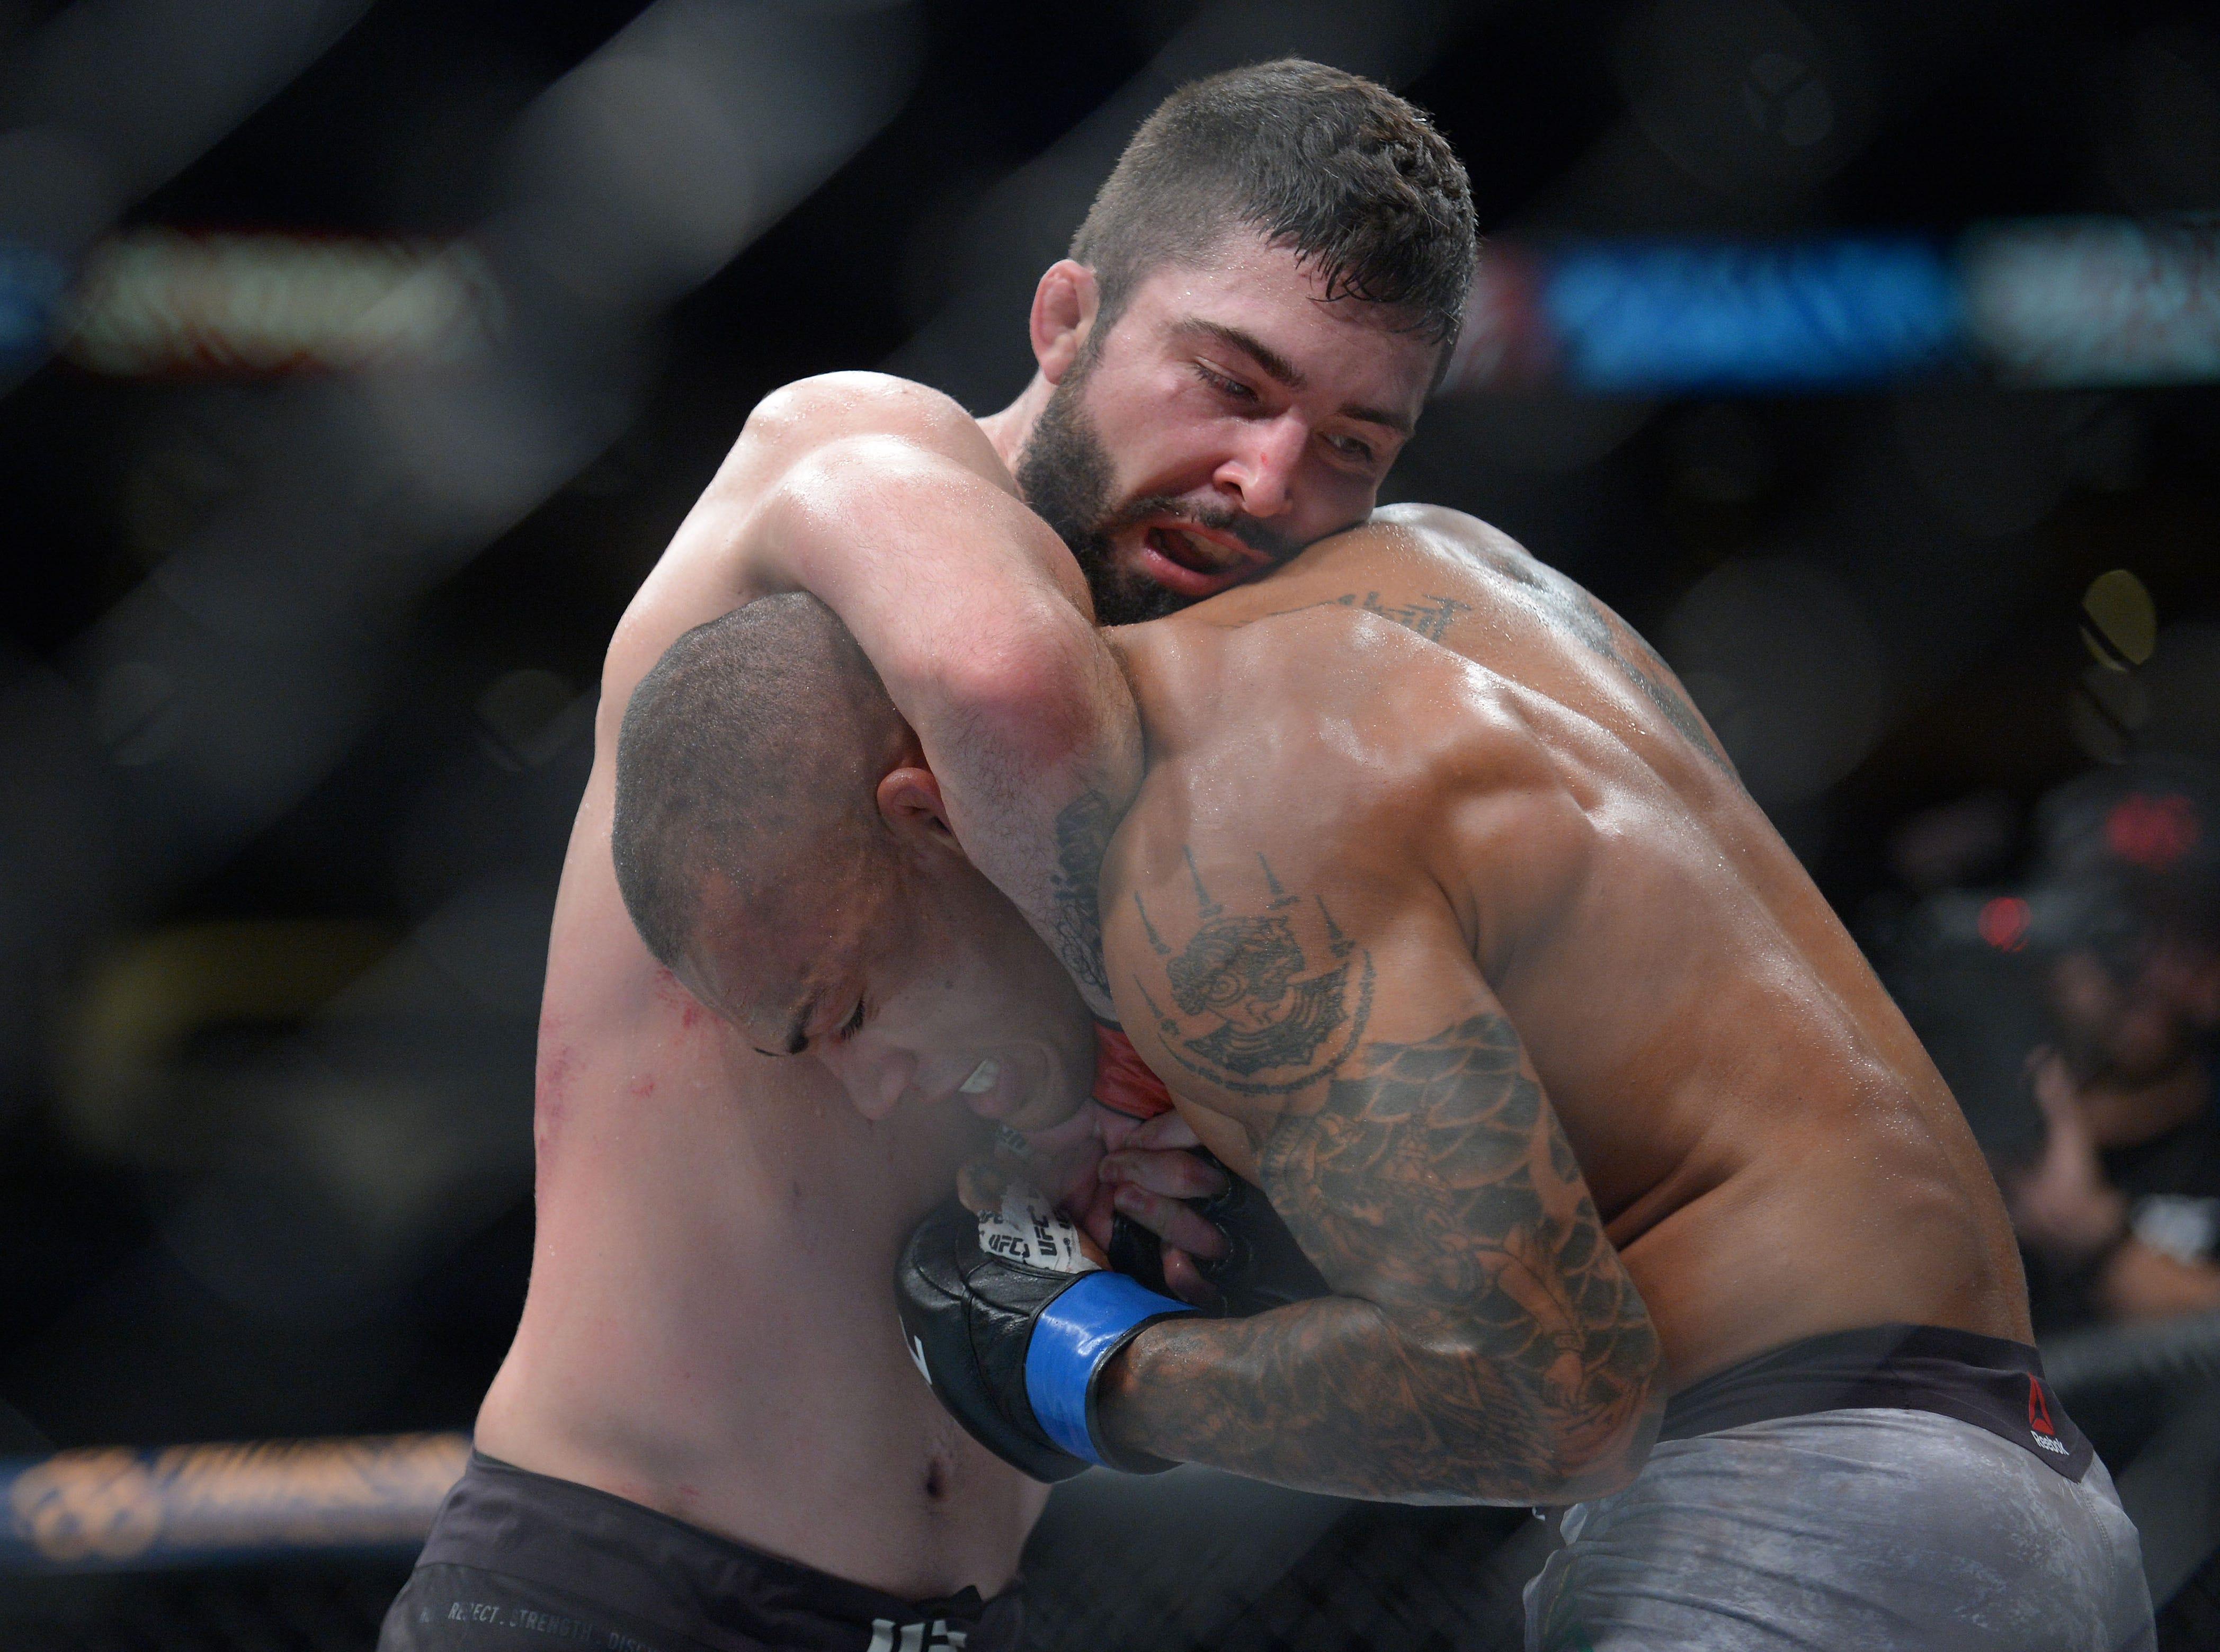 Matt Sayles applies a hold against Sheymon Moreas during UFC 227 at Staples Center.